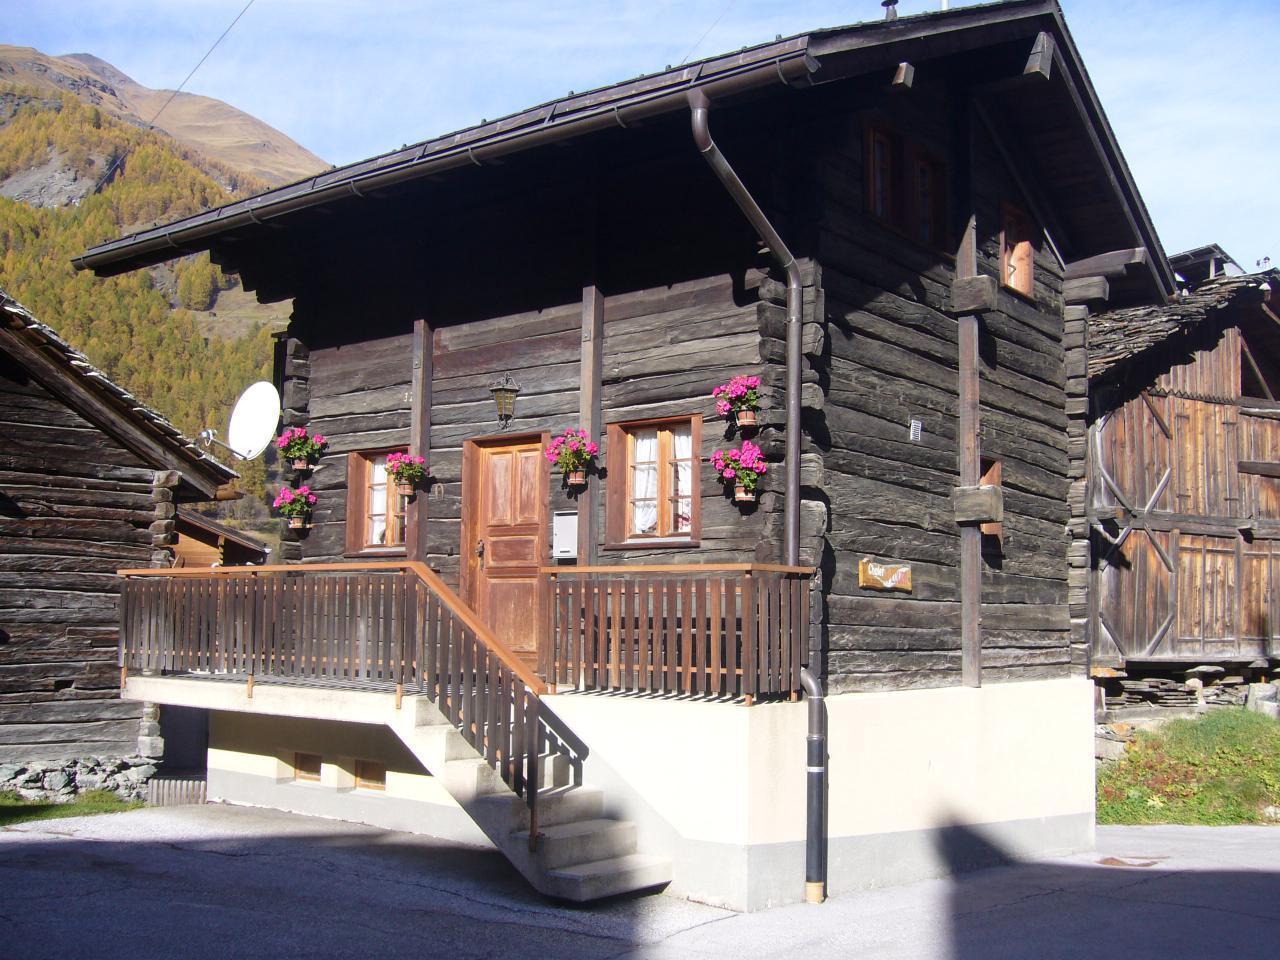 Ferienhaus Kleines Ferienhaus 4 Personen (1642490), Les Haudères, Val d'Hérens, Wallis, Schweiz, Bild 8